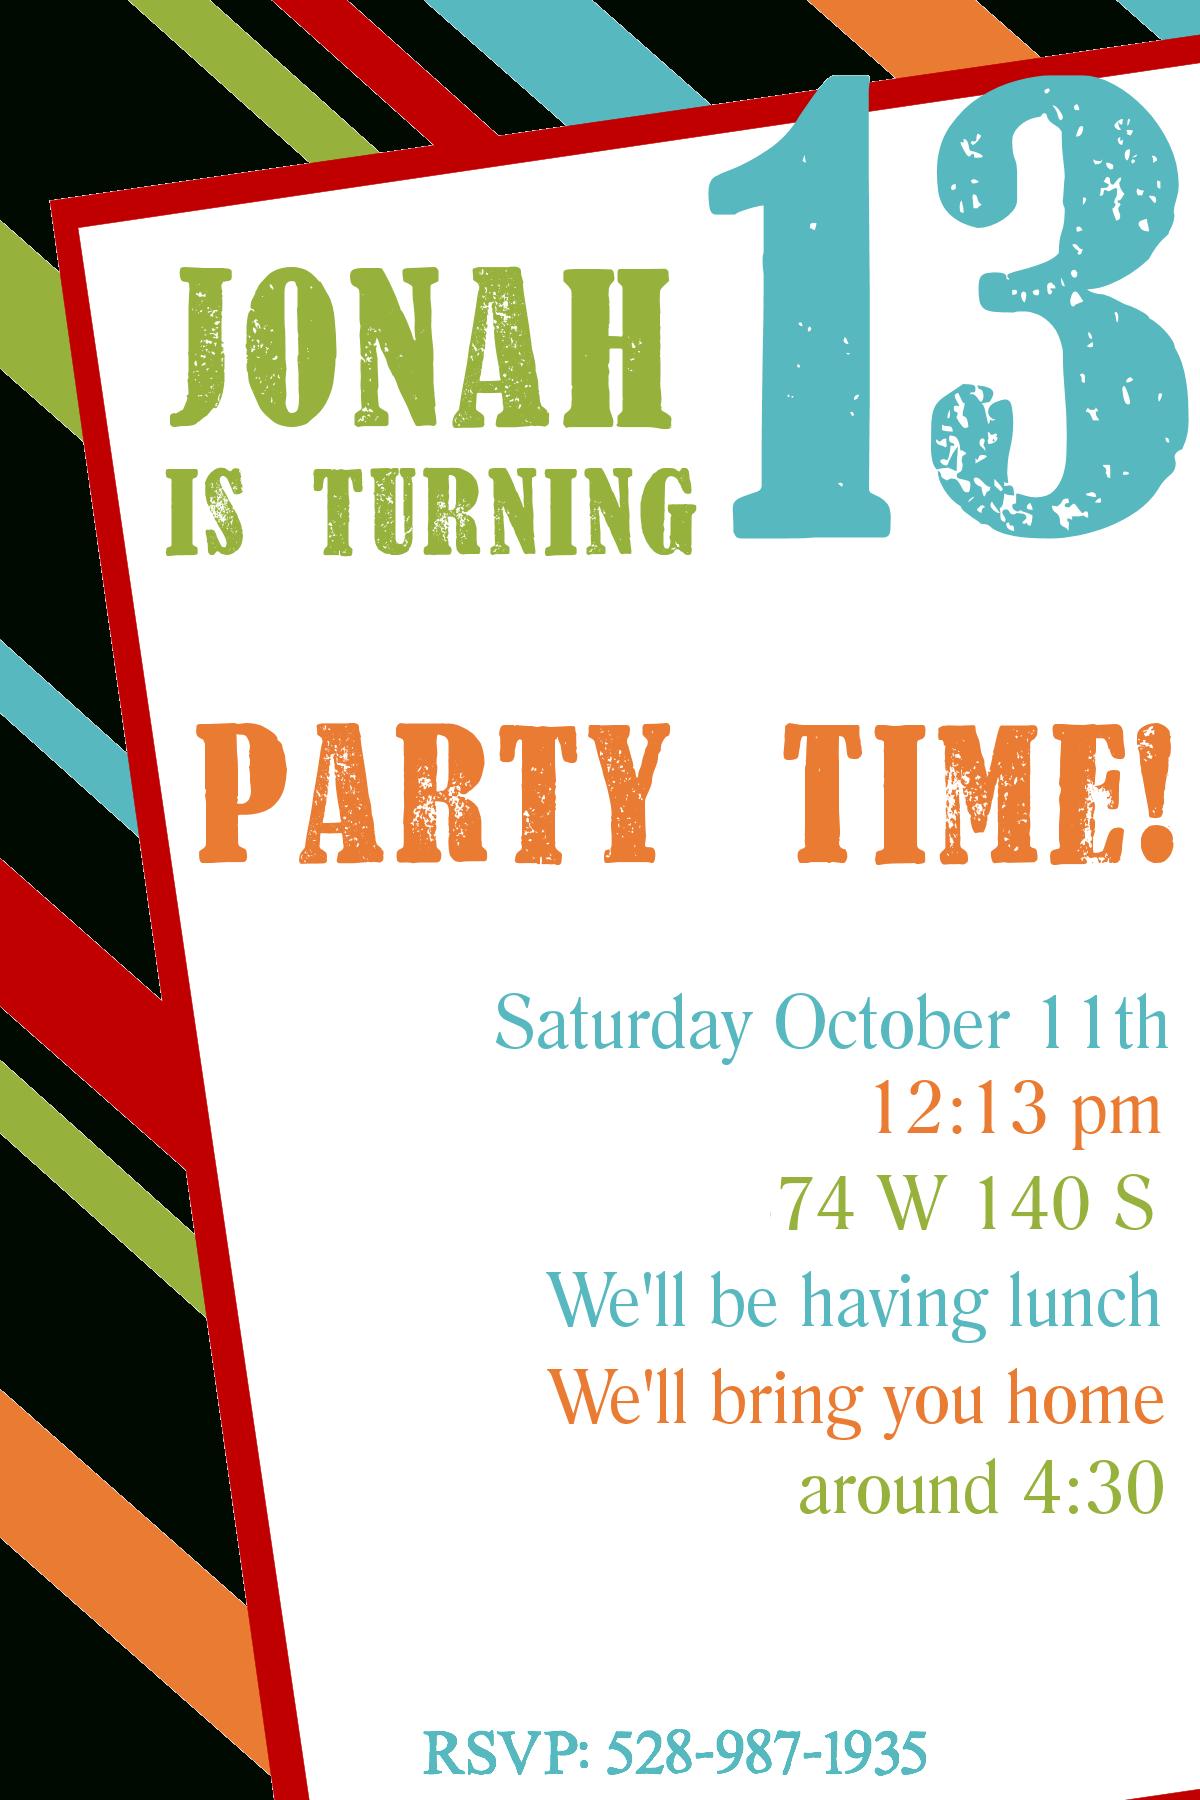 Free Printable Birthday Invitation Templates | Printables - Free Printable Surprise Party Invitation Templates